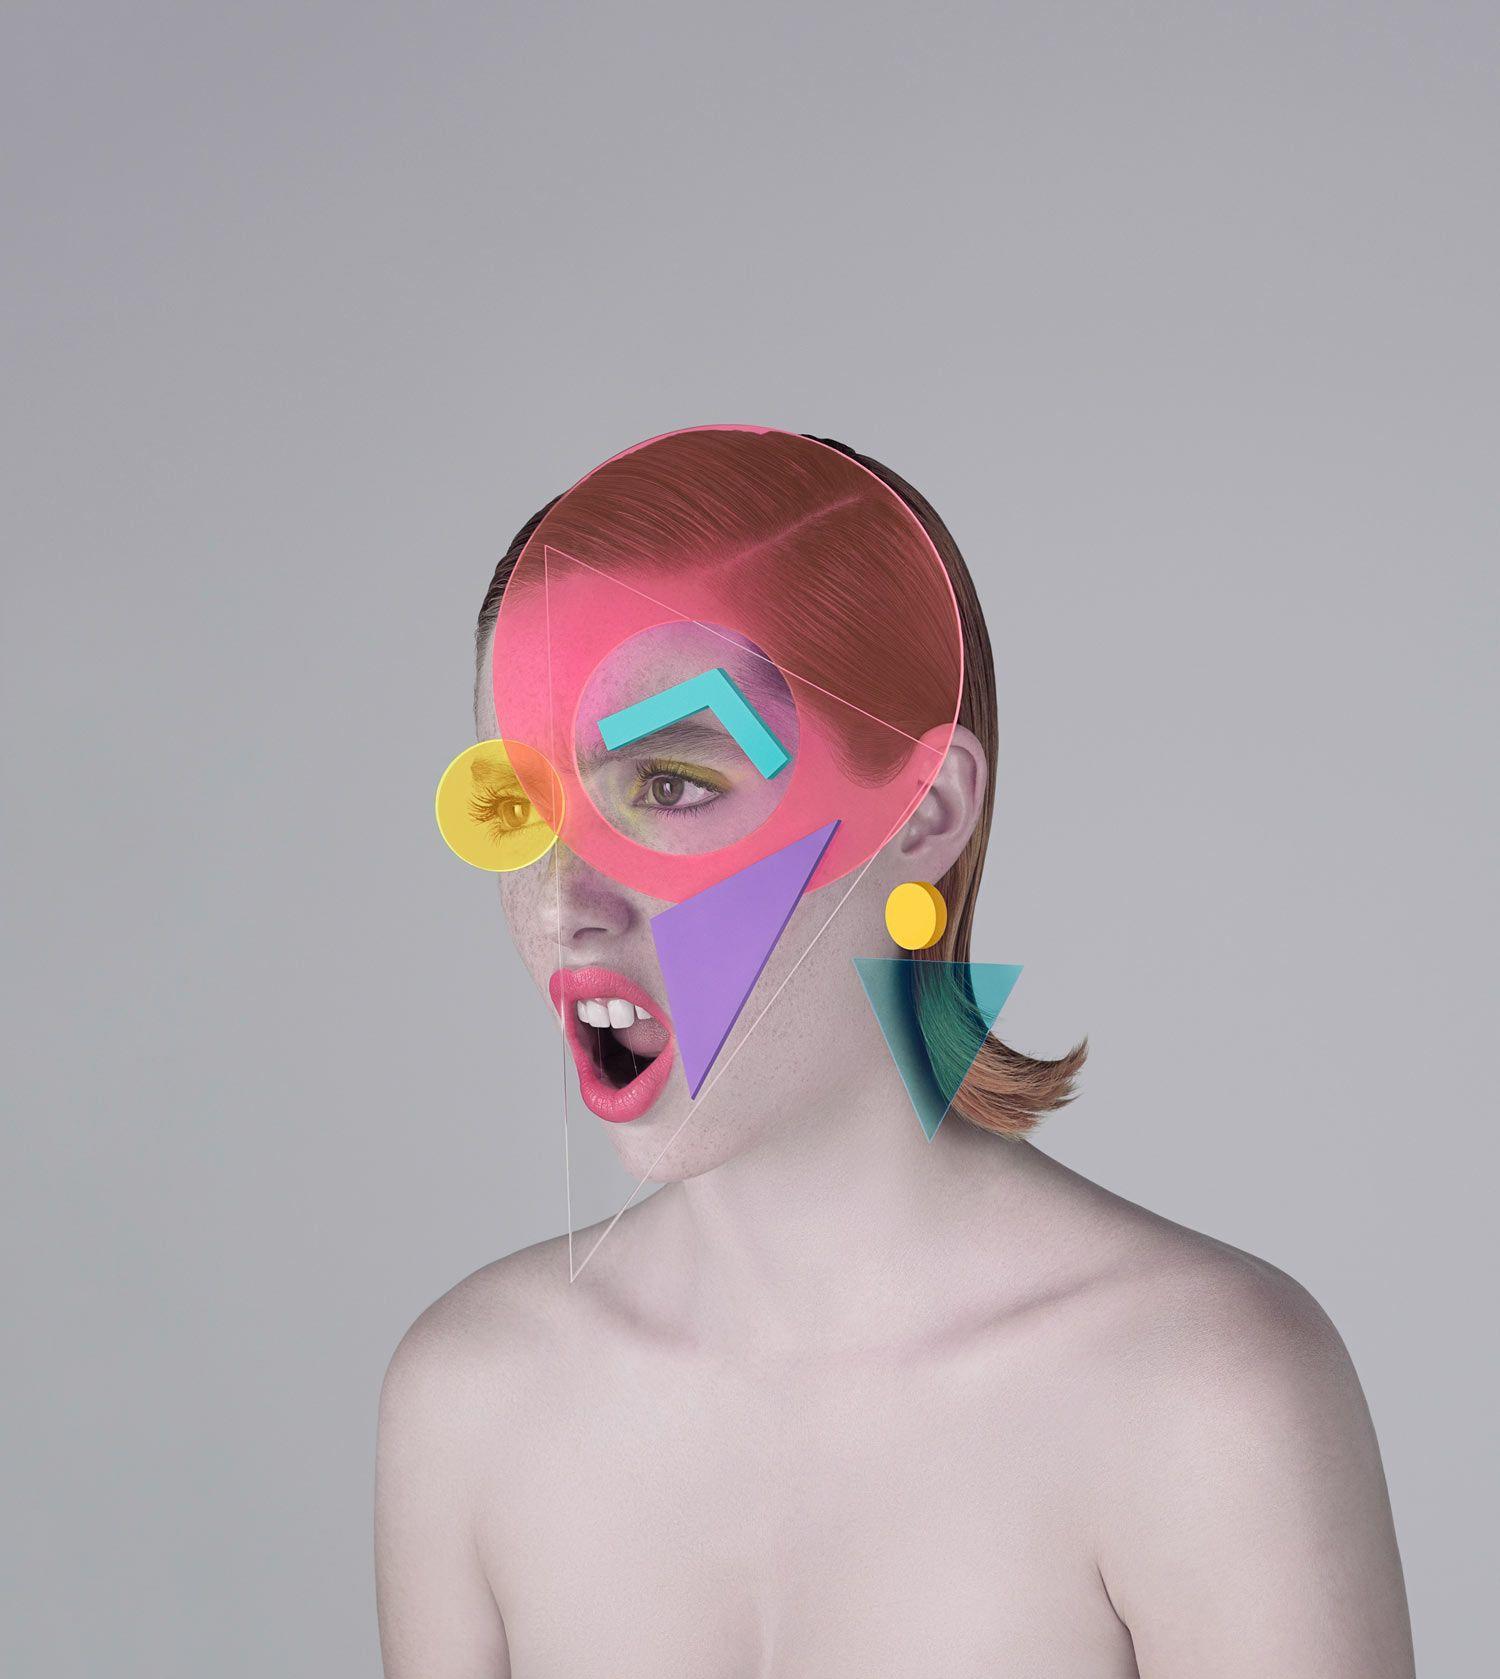 I See Faces by Álvaro Peñalta in 2020 Face, Cinematic